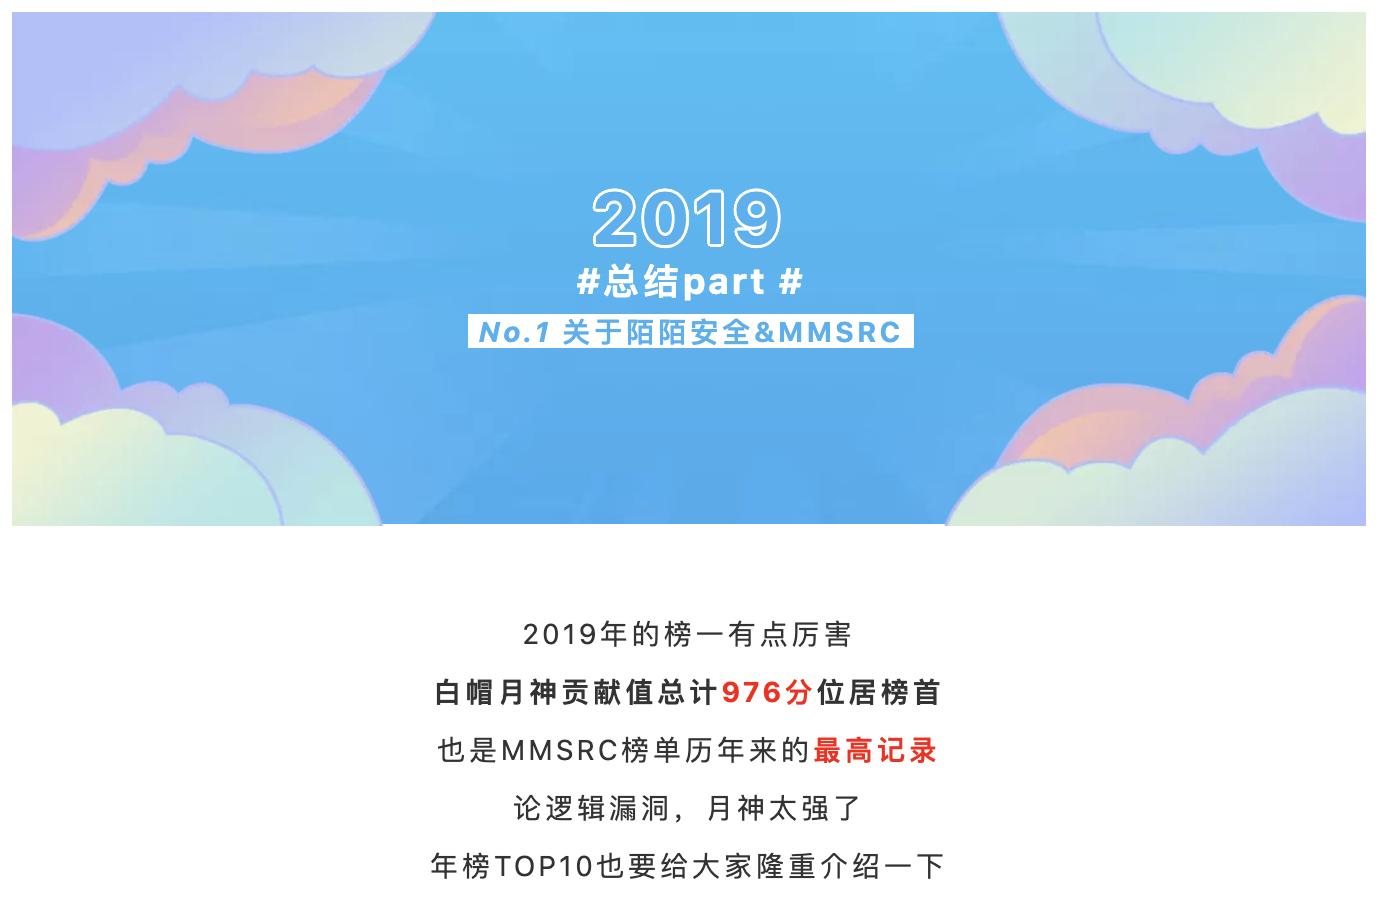 https://momo-mmsrc.oss-cn-hangzhou.aliyuncs.com/img-d2782191-fd42-34c4-b3c8-82c184588e68.png